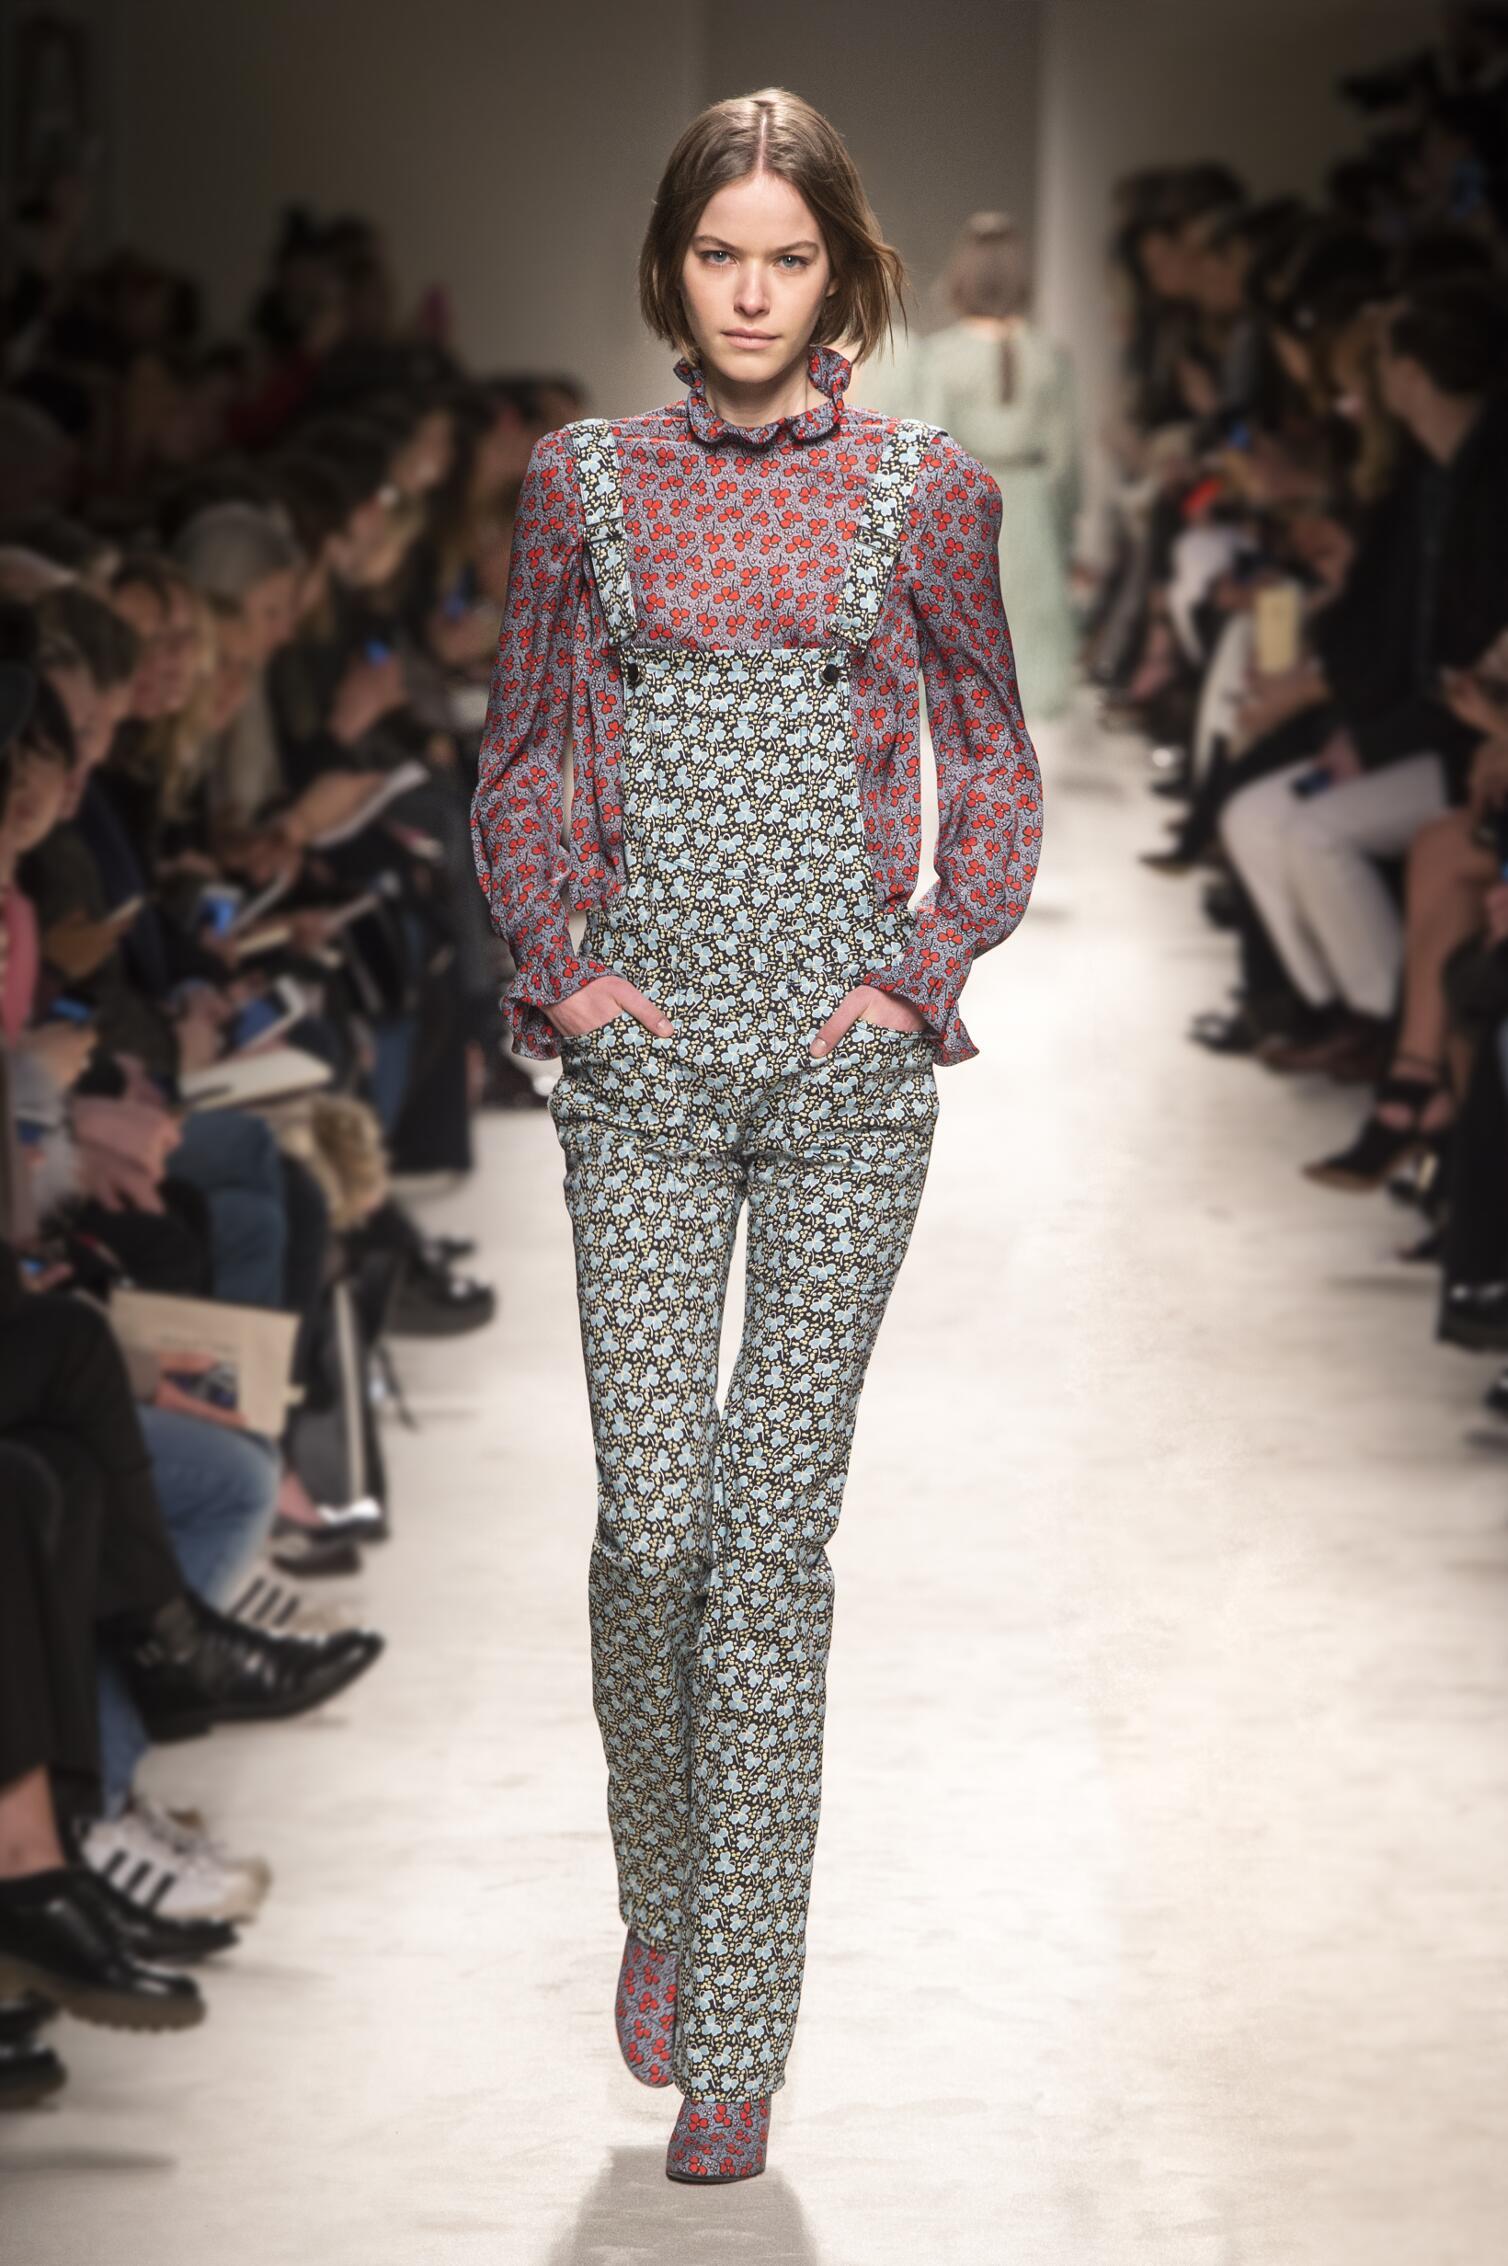 Fall Fashion 2015 2016 Philosophy di Lorenzo Serafini Collection